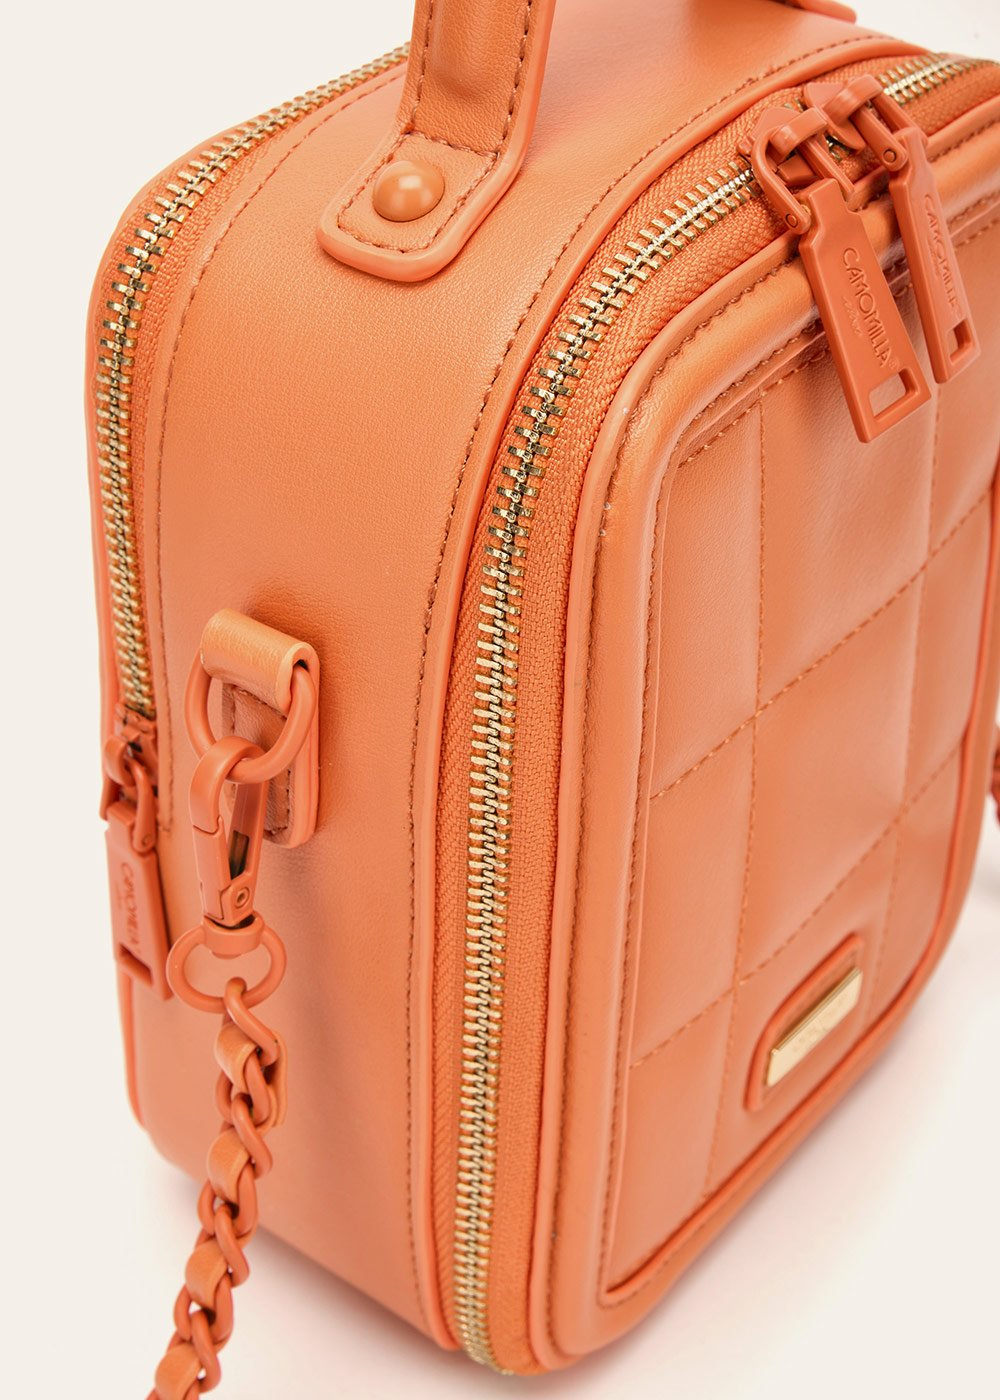 Barley multi-compartment clutch bag - Melon - Woman